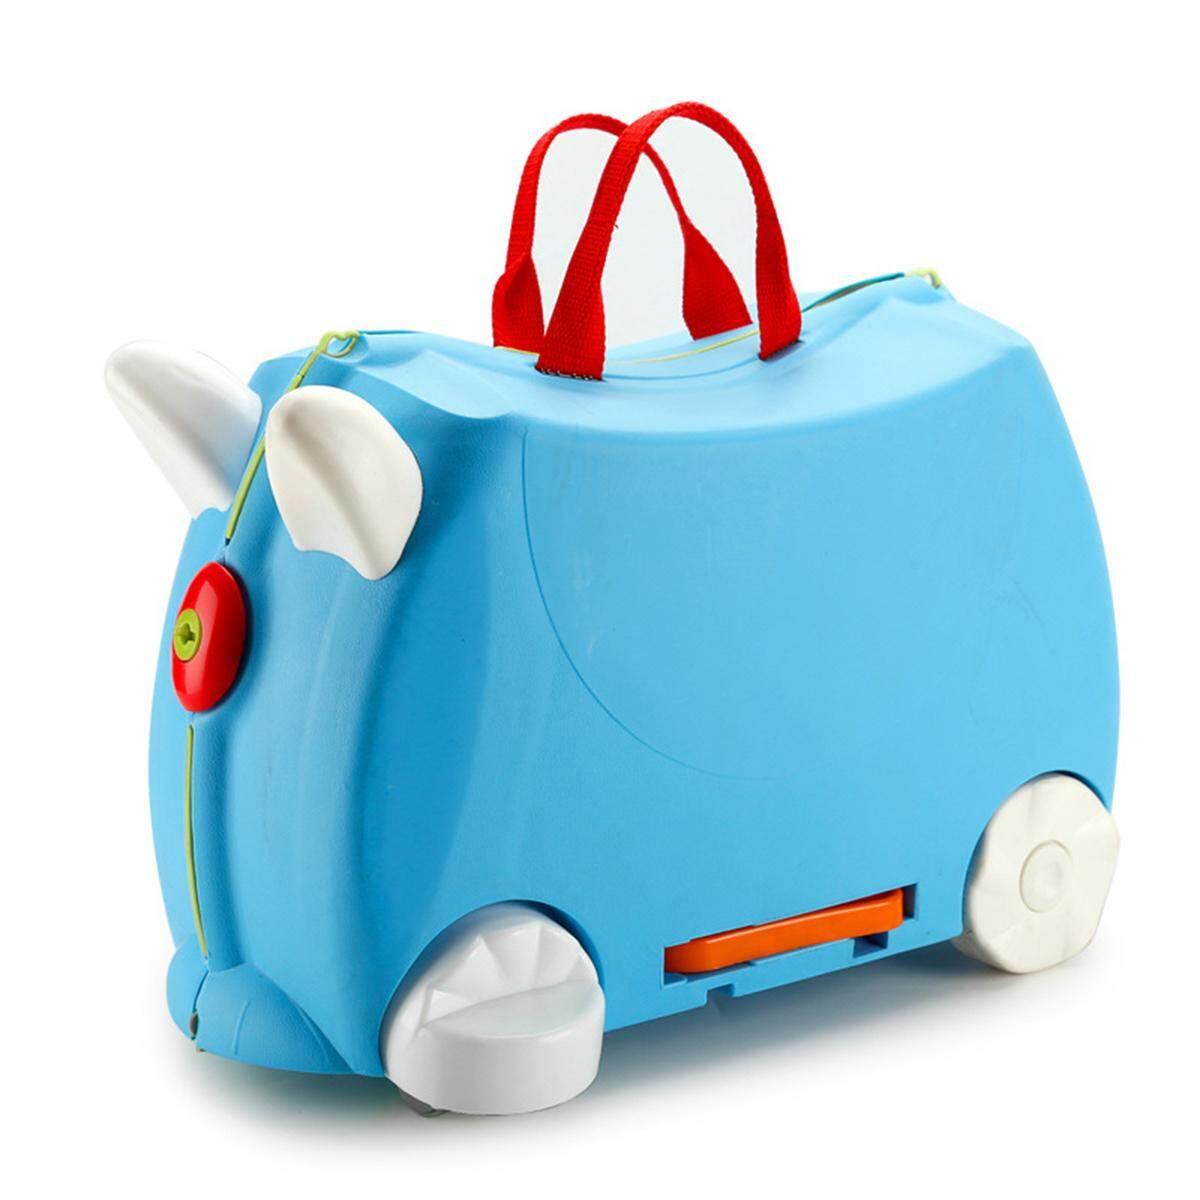 Ride On Suitcase Toy Box Kids Children Travel Luggage 3 Colour Pink Blue HQLU577